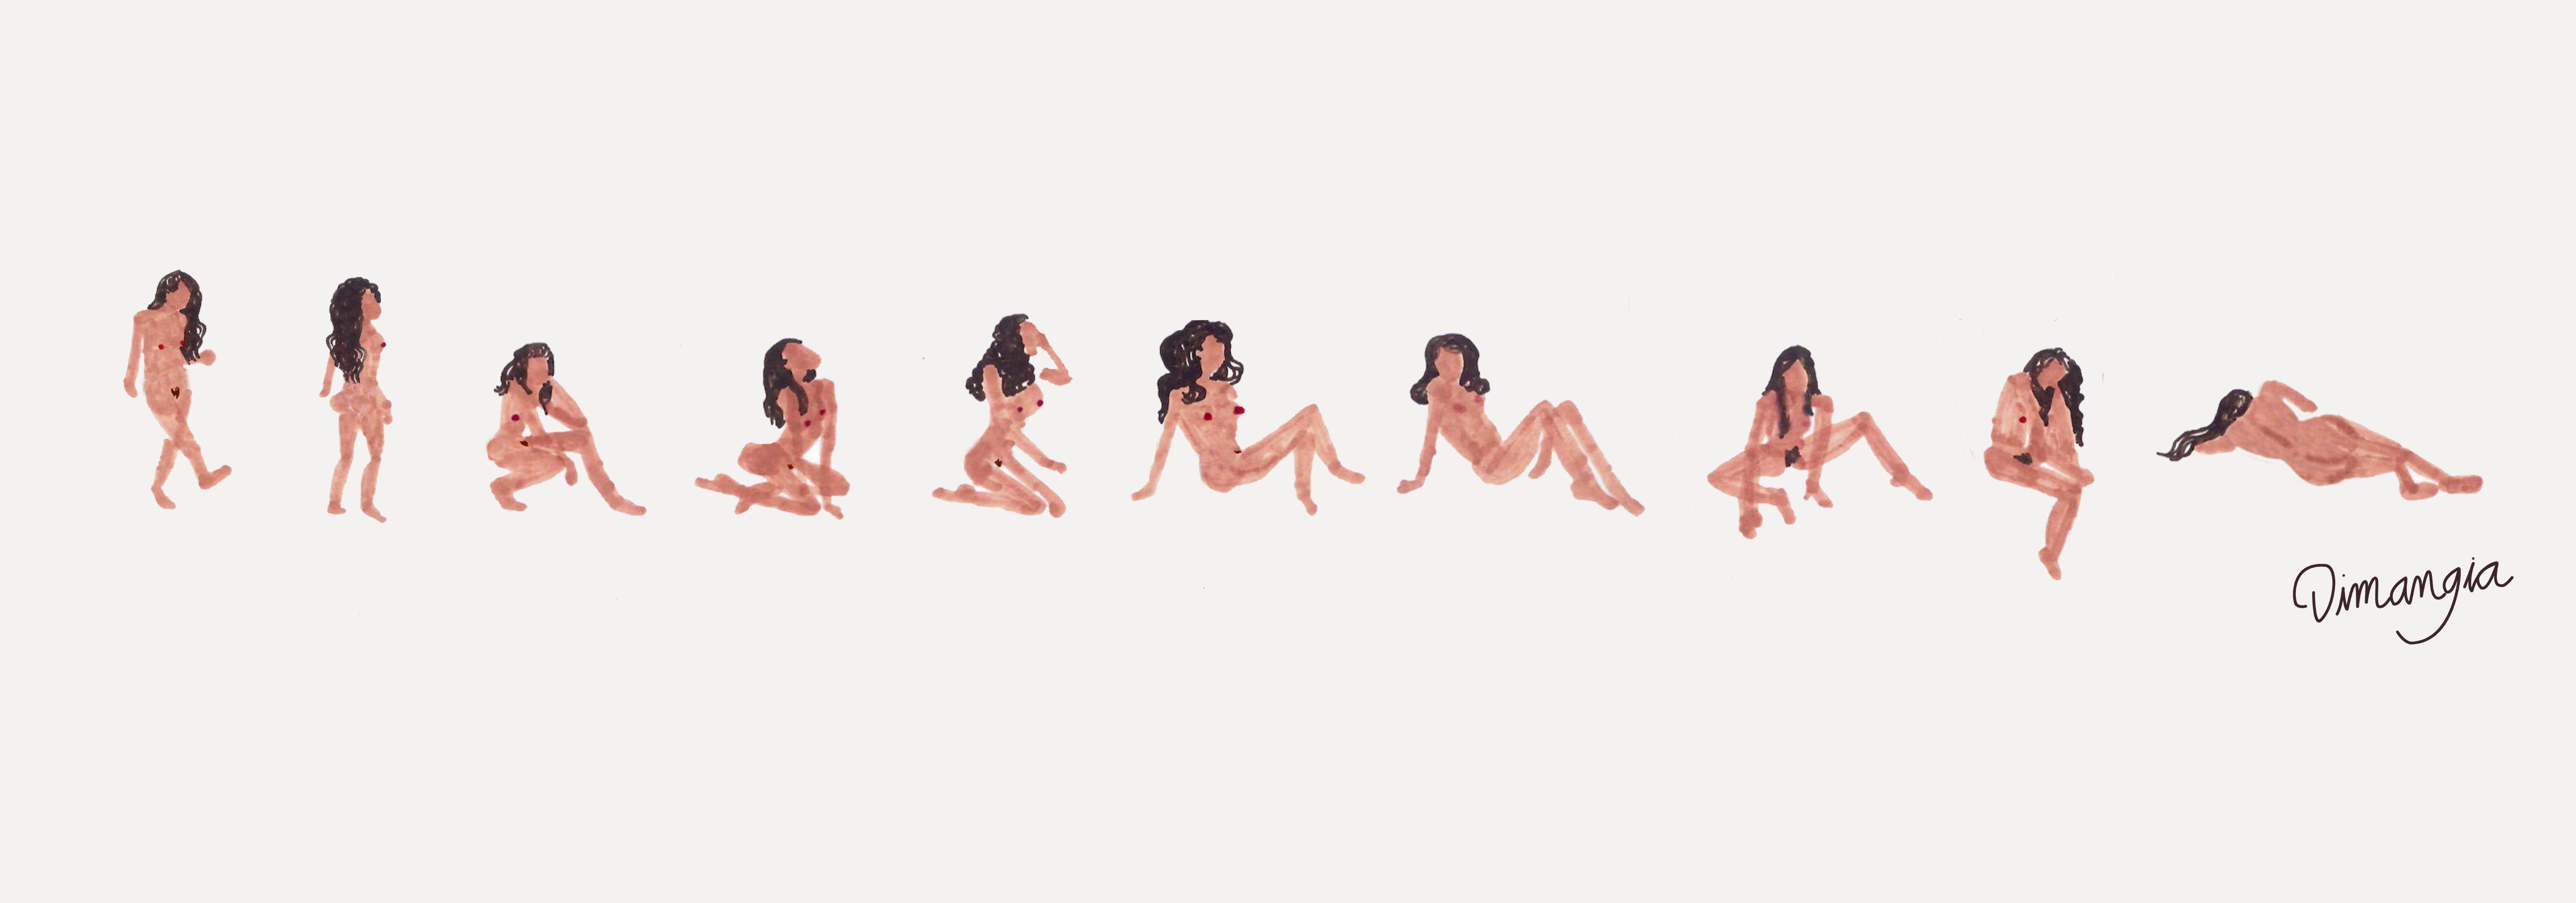 El recorrido a nosotras mismas       #illustration #illustracion #ilustracion #dibujo #drawing #drawoftheday #draw #sketch #design #graphic #graphicdesign #art #arte #designer #instaart #instaartist #instart #love #amor #live #feminismo #feminism #woman #mujer #love #sororidad #girlpower #mujeres #dimangia